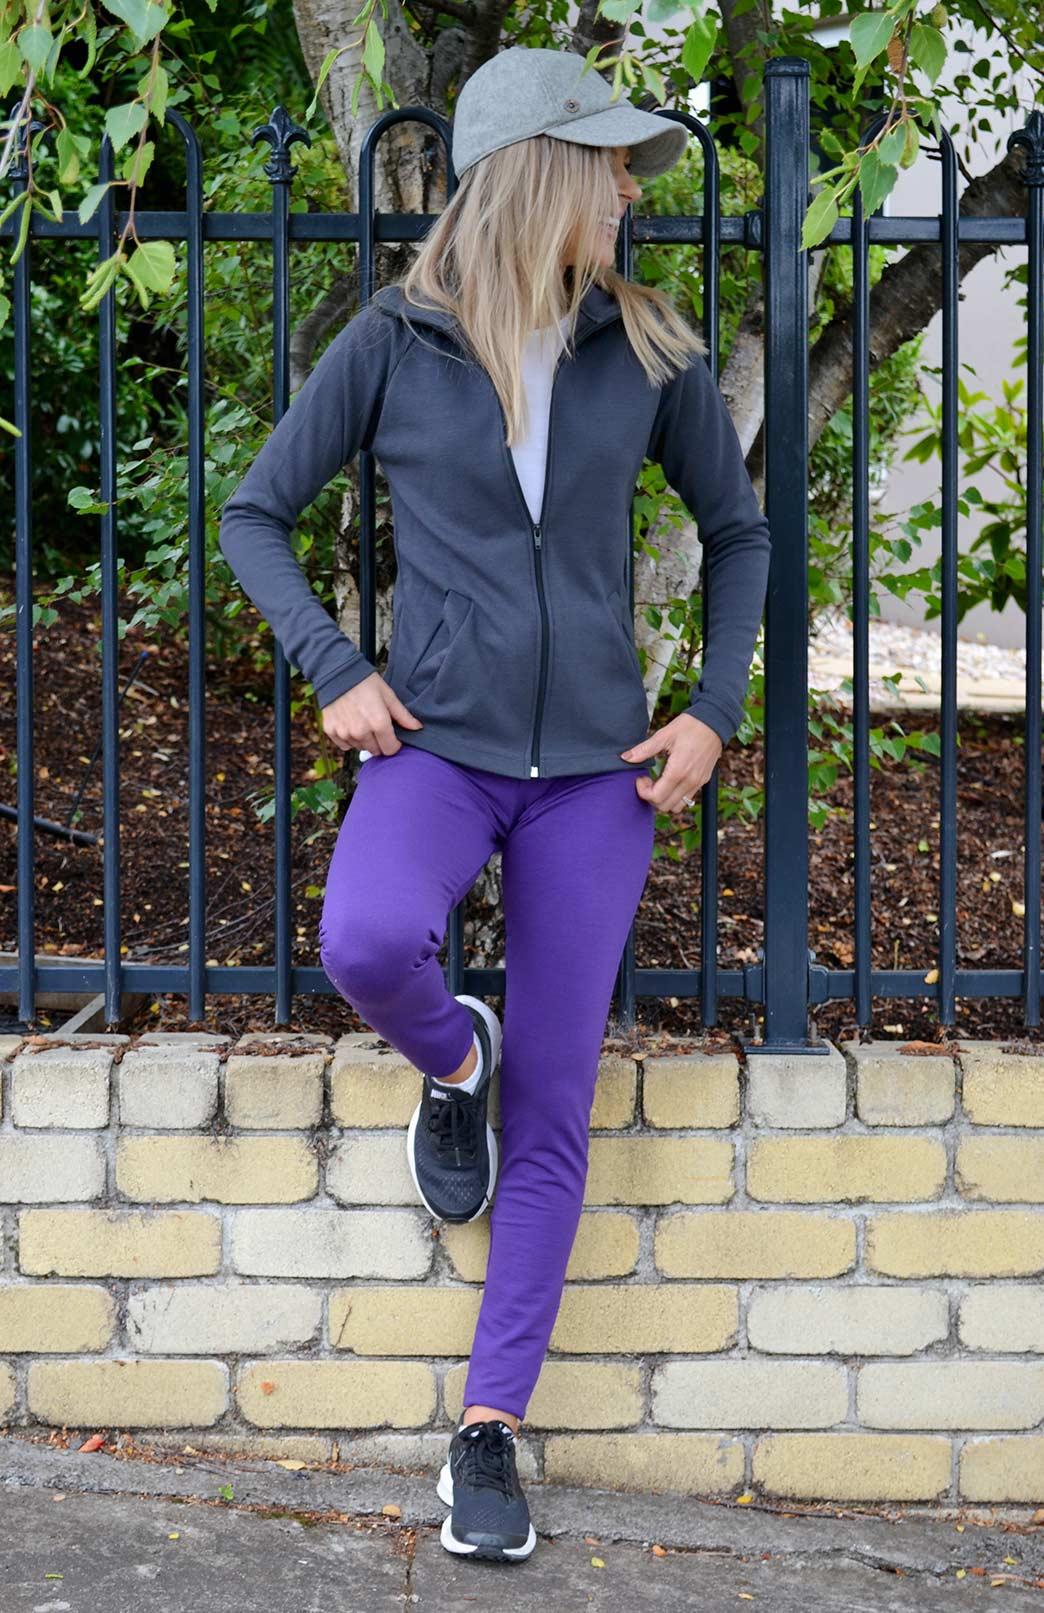 Zip Jacket - Heavyweight (360g) - Women's Merino Wool Steel Grey Zip Jacket with full zip and pockets - Smitten Merino Tasmania Australia